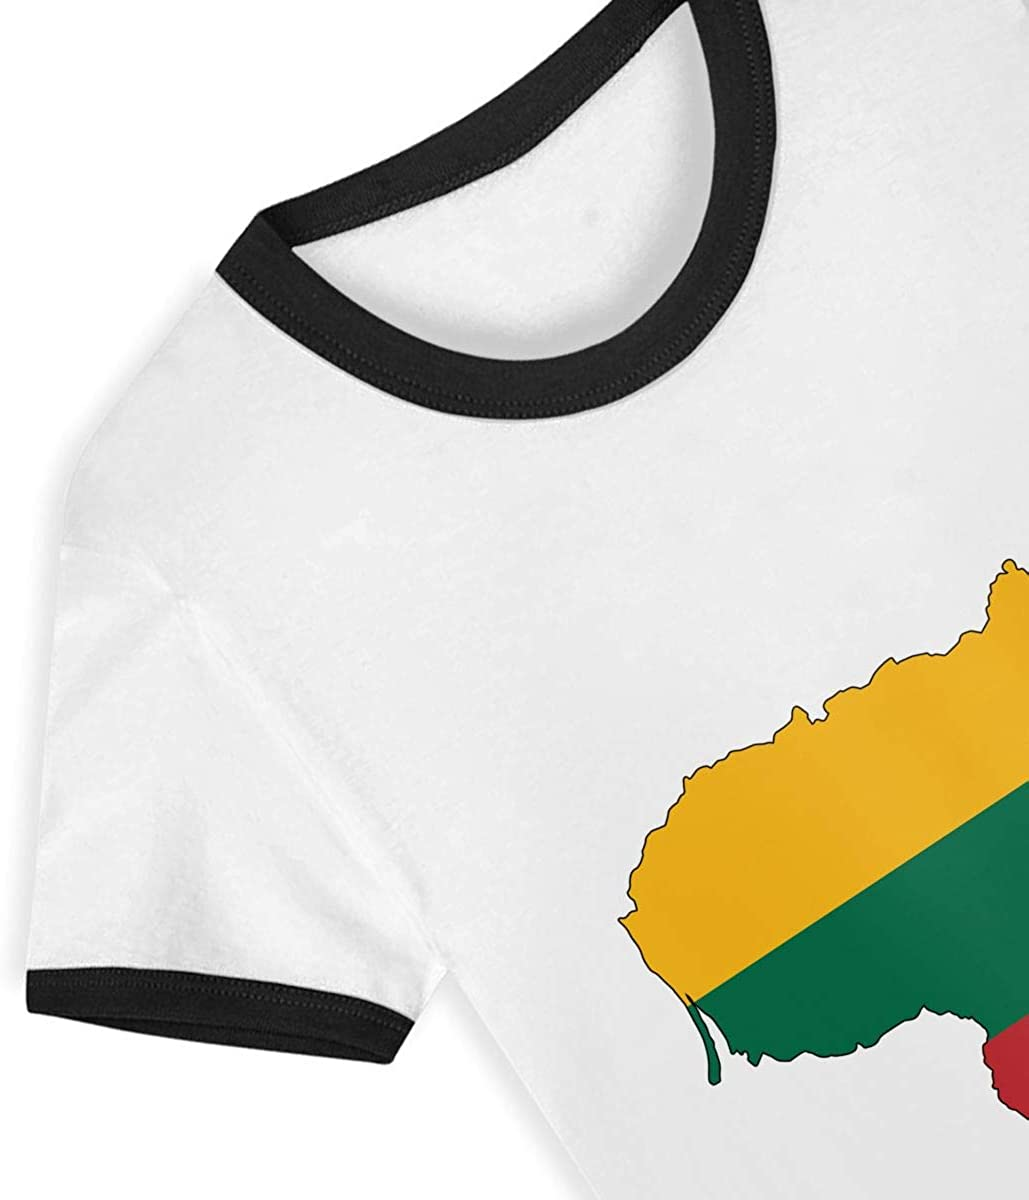 Crew Neck Cotton T-Shirt for Children T4Tenager Lithuania Toddler Boys Girls Kids Short-Sleeve Tee